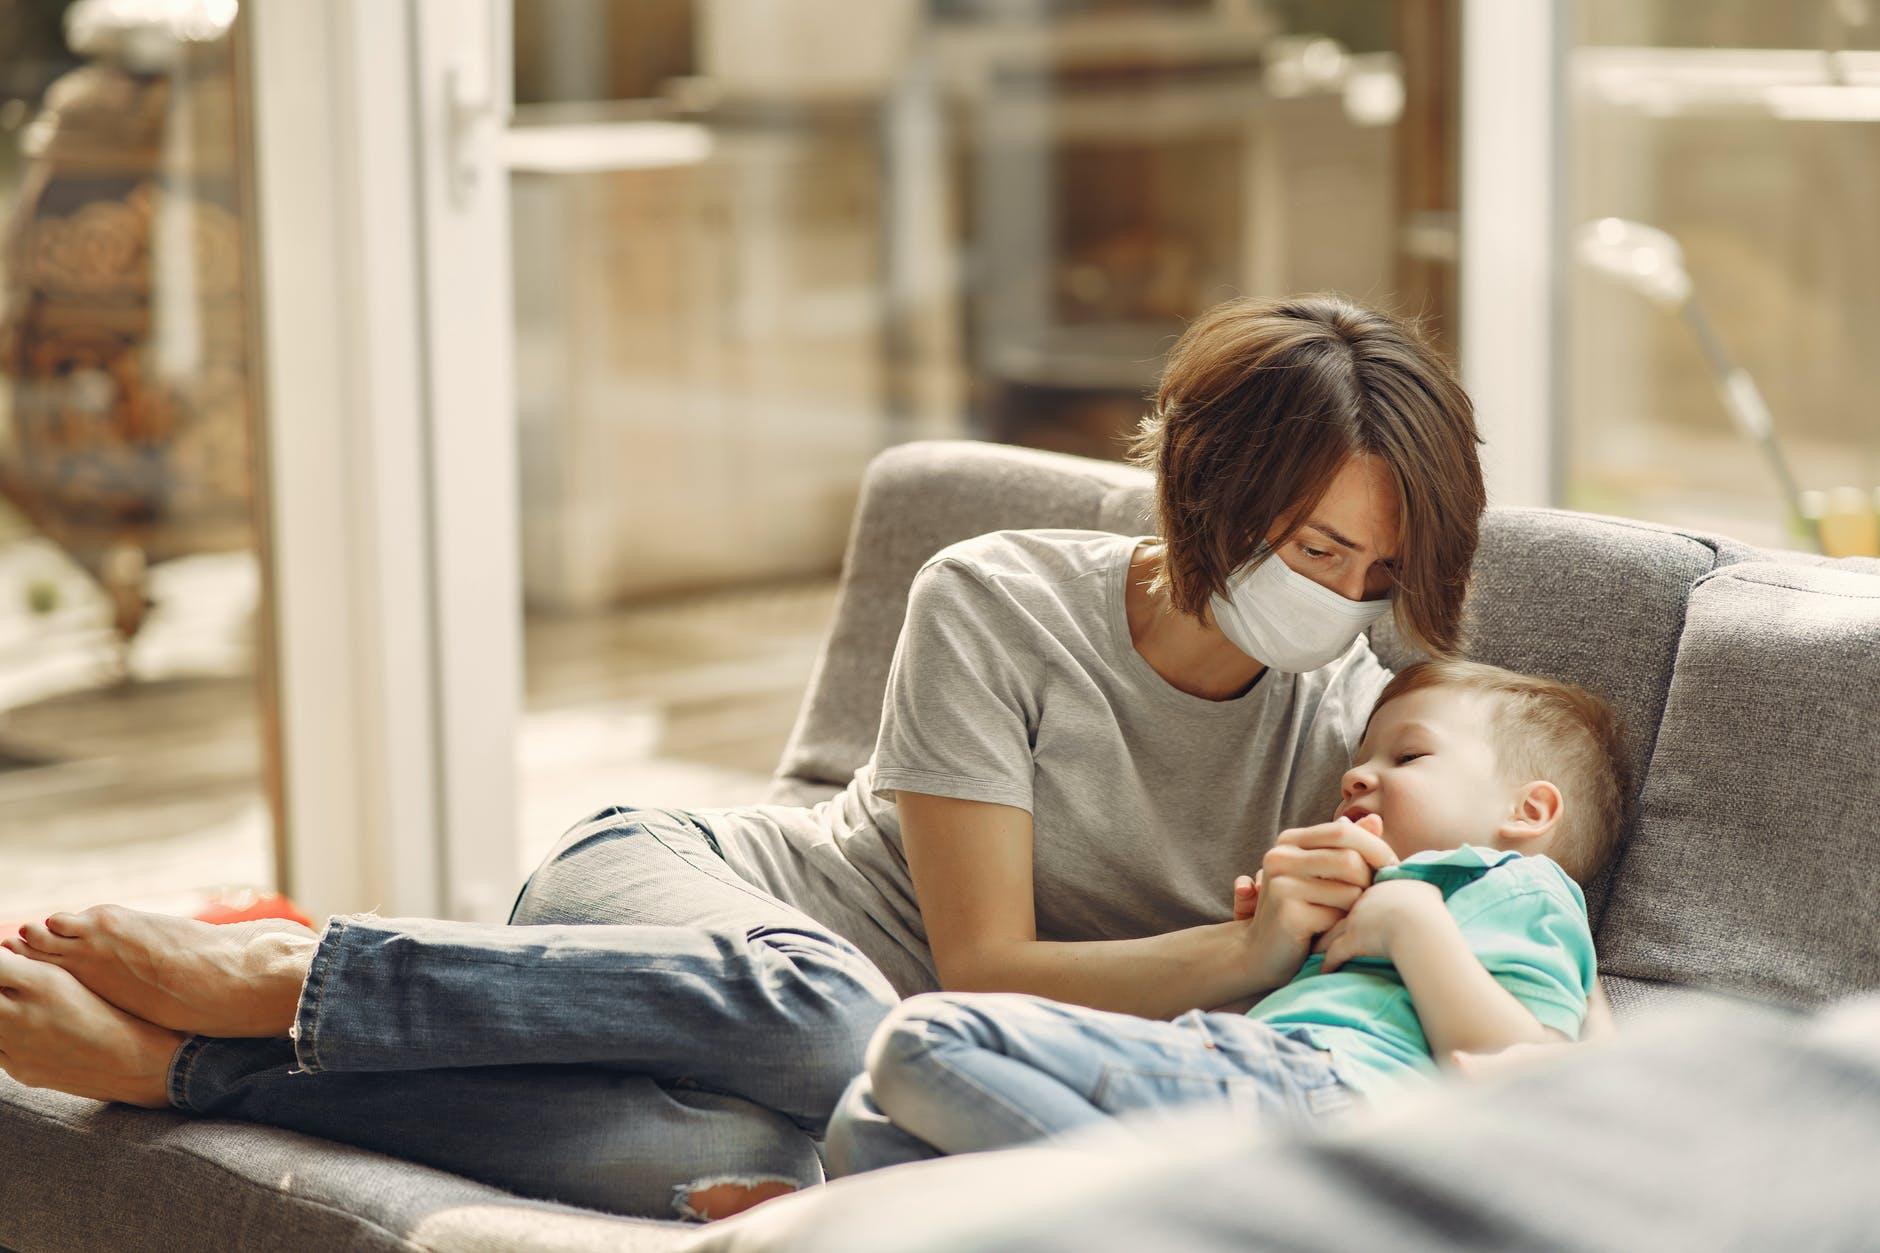 Natural Cleaners for Coronavirus